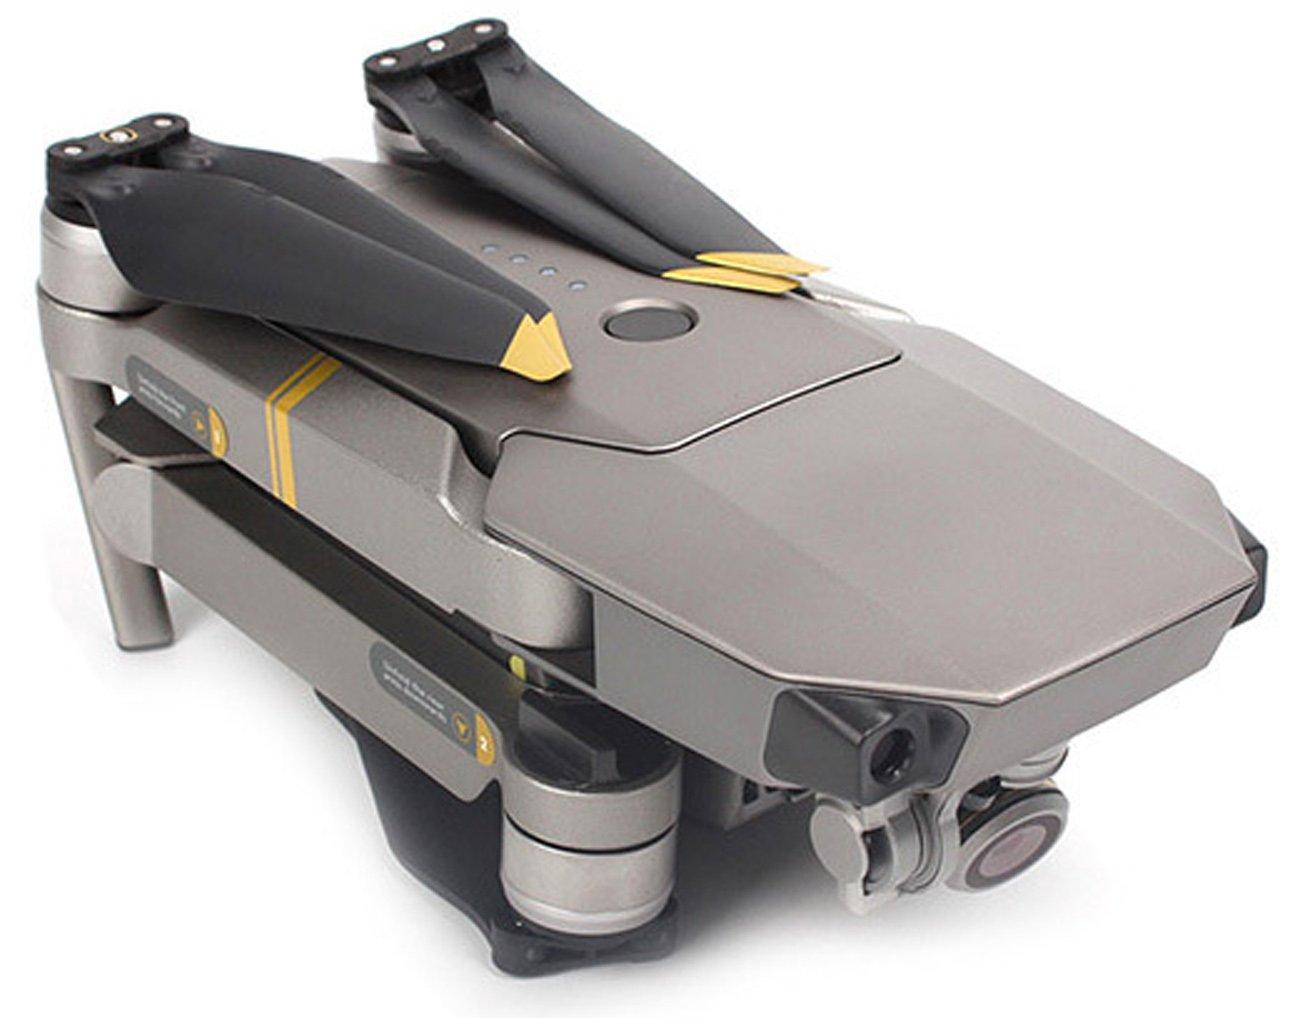 Czfriend 2 Sets 8331f Folding Propeller Noise Reduction Blades For Dji Mavic Propellers Pro Platinum